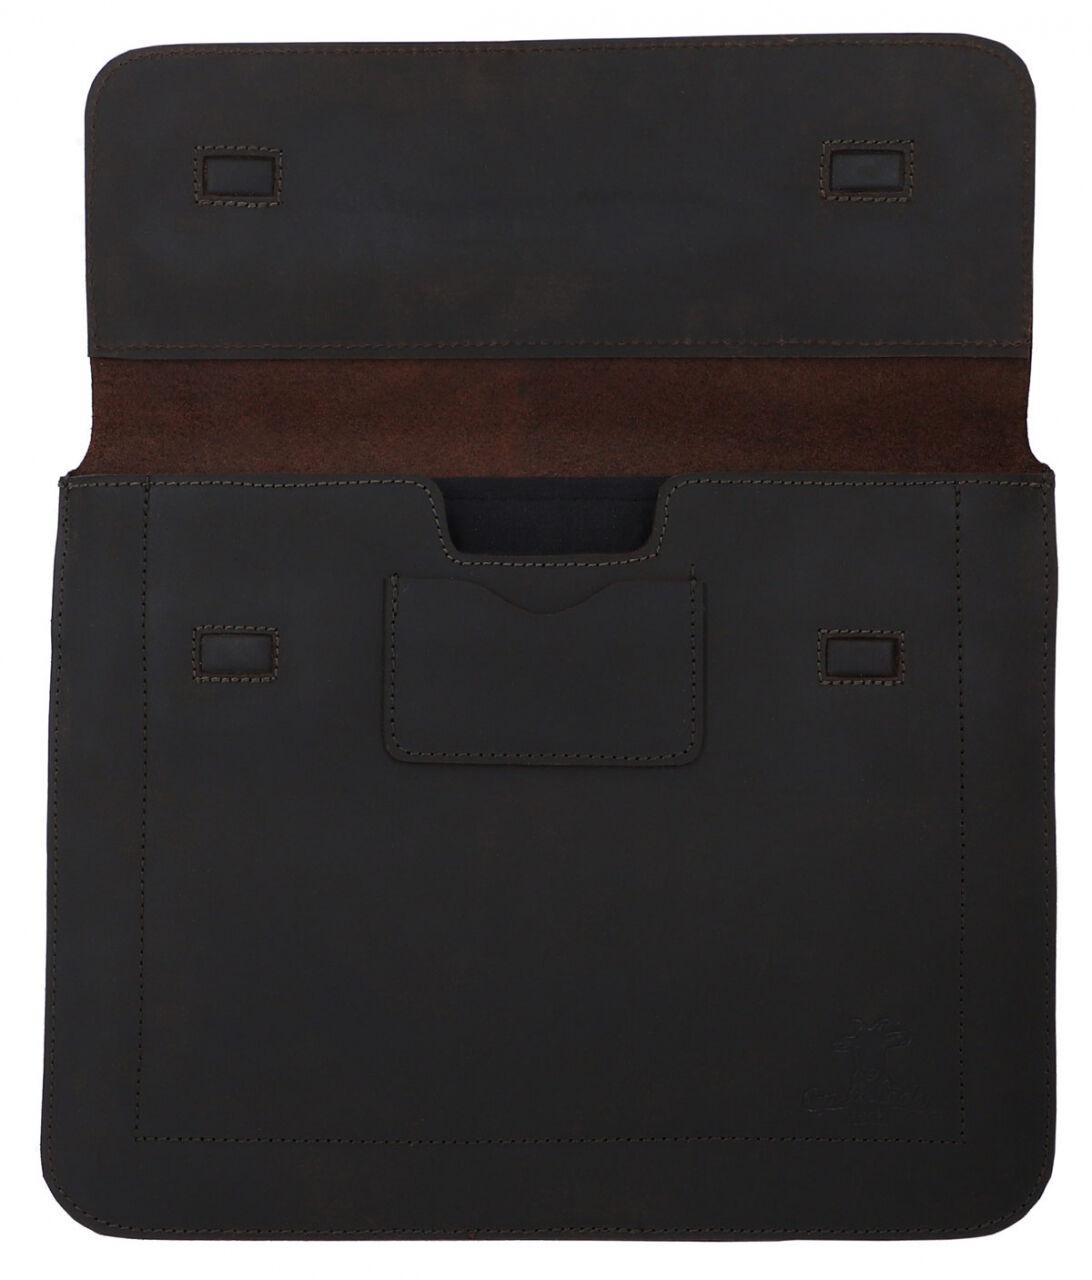 Outlet Laptophülle - defekte Nähte - kleinere Lederfehler – Leder leicht fettig - ansonsten neu – si